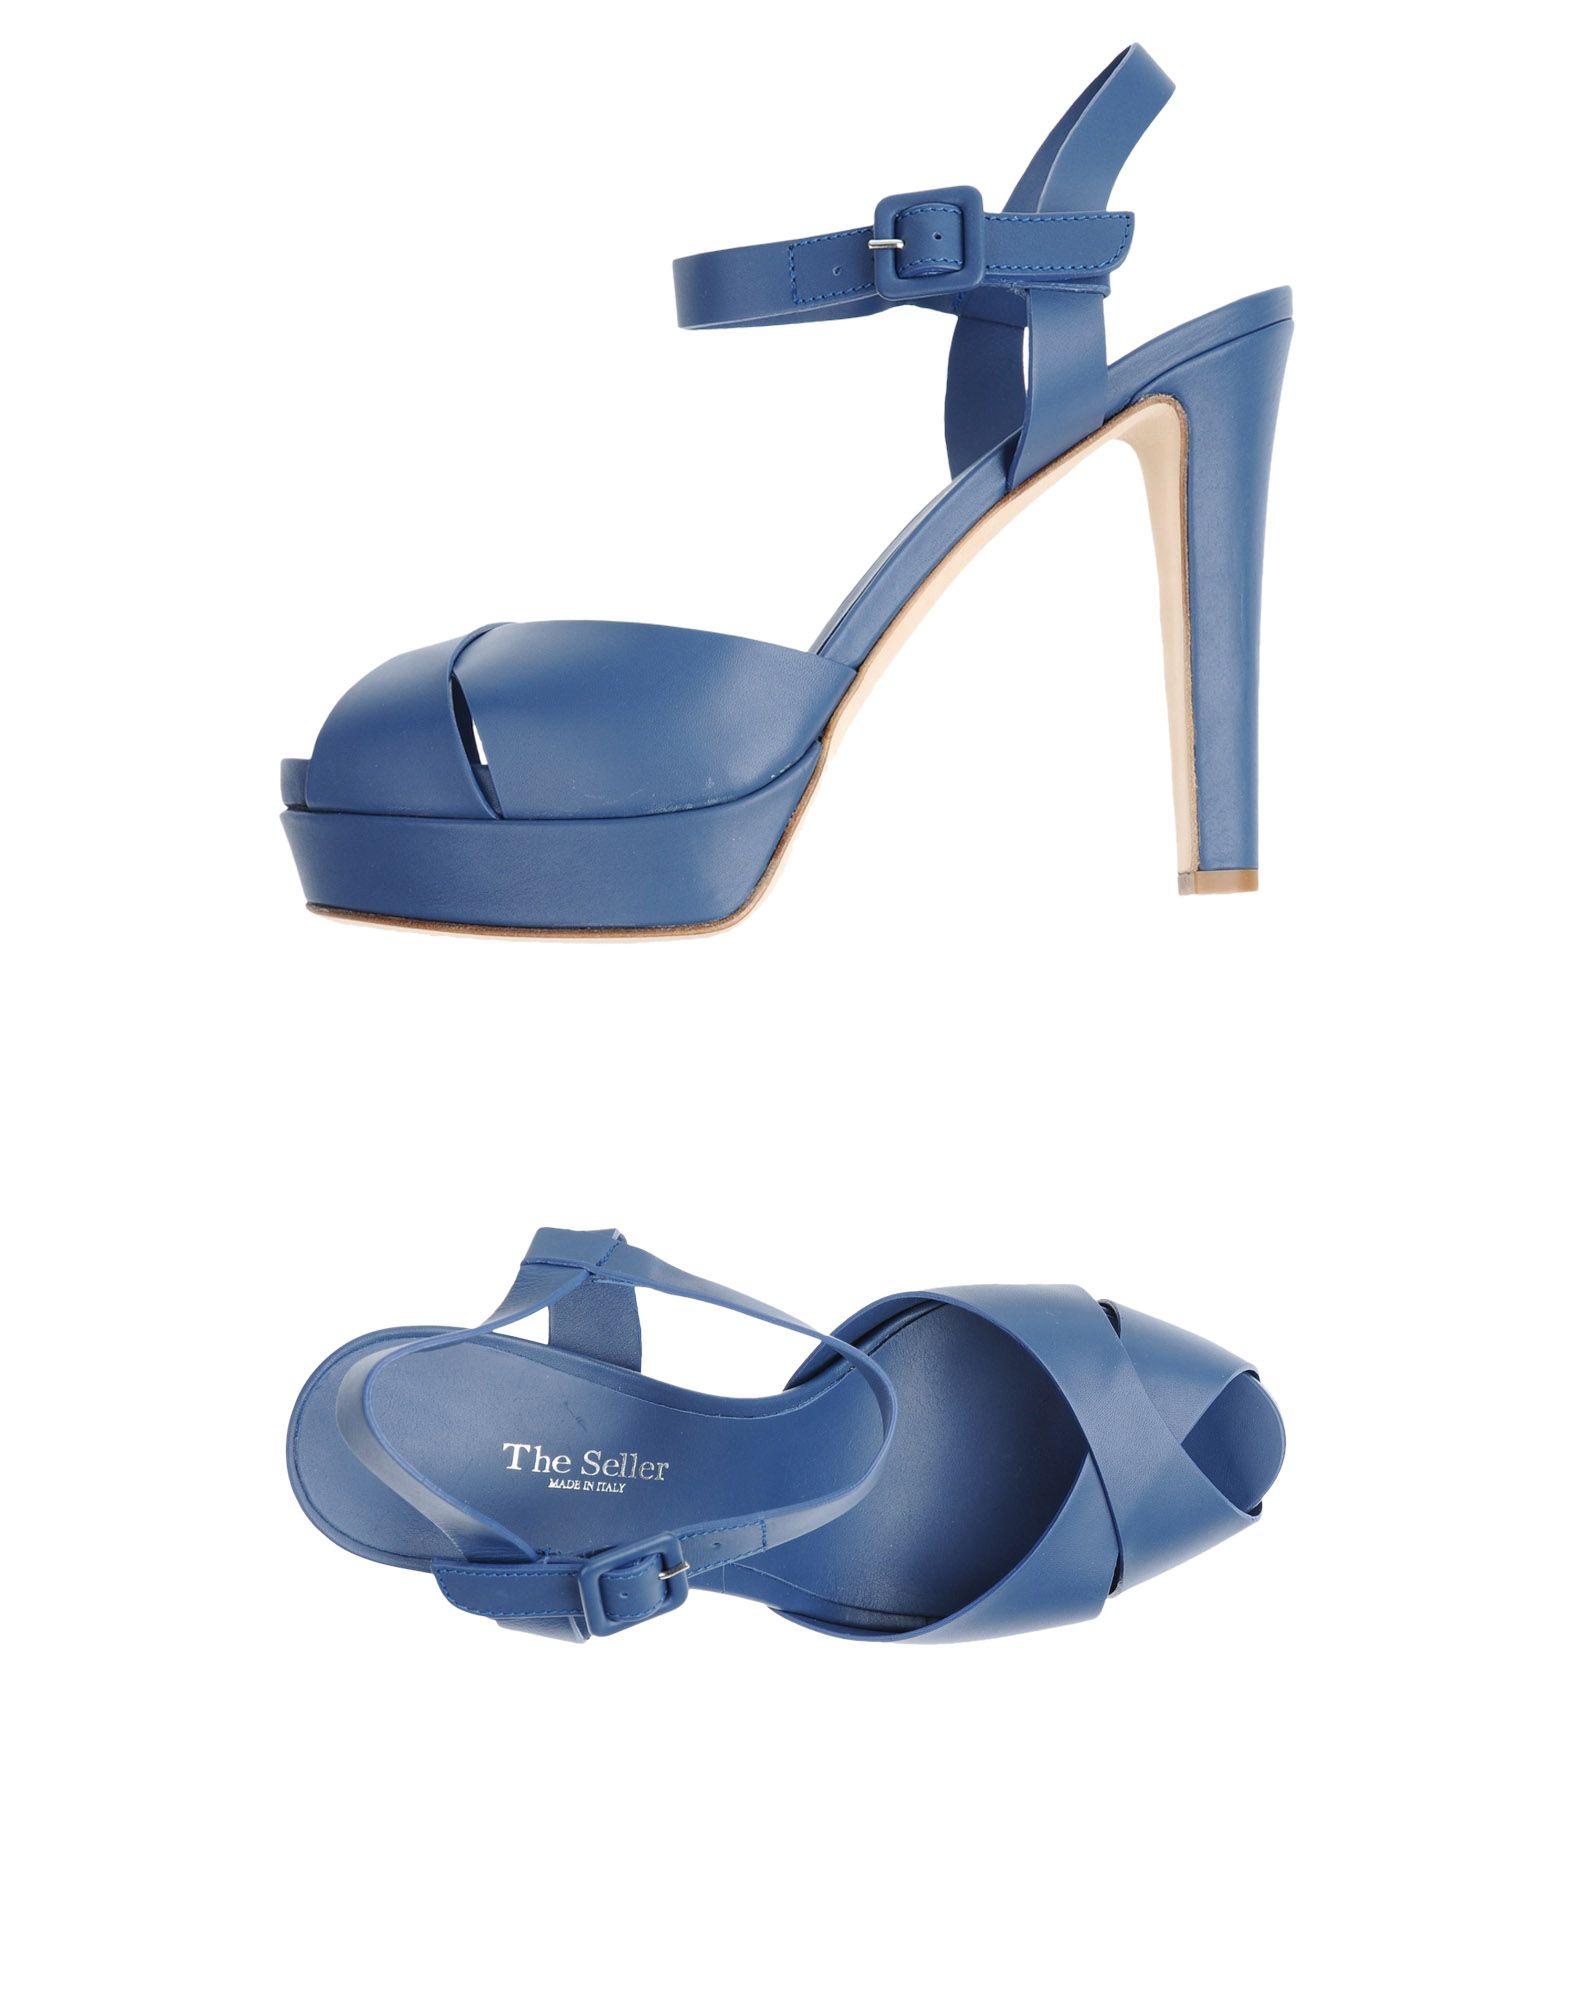 THE SELLER Damen Sandale Farbe Blau Größe 13 - broschei